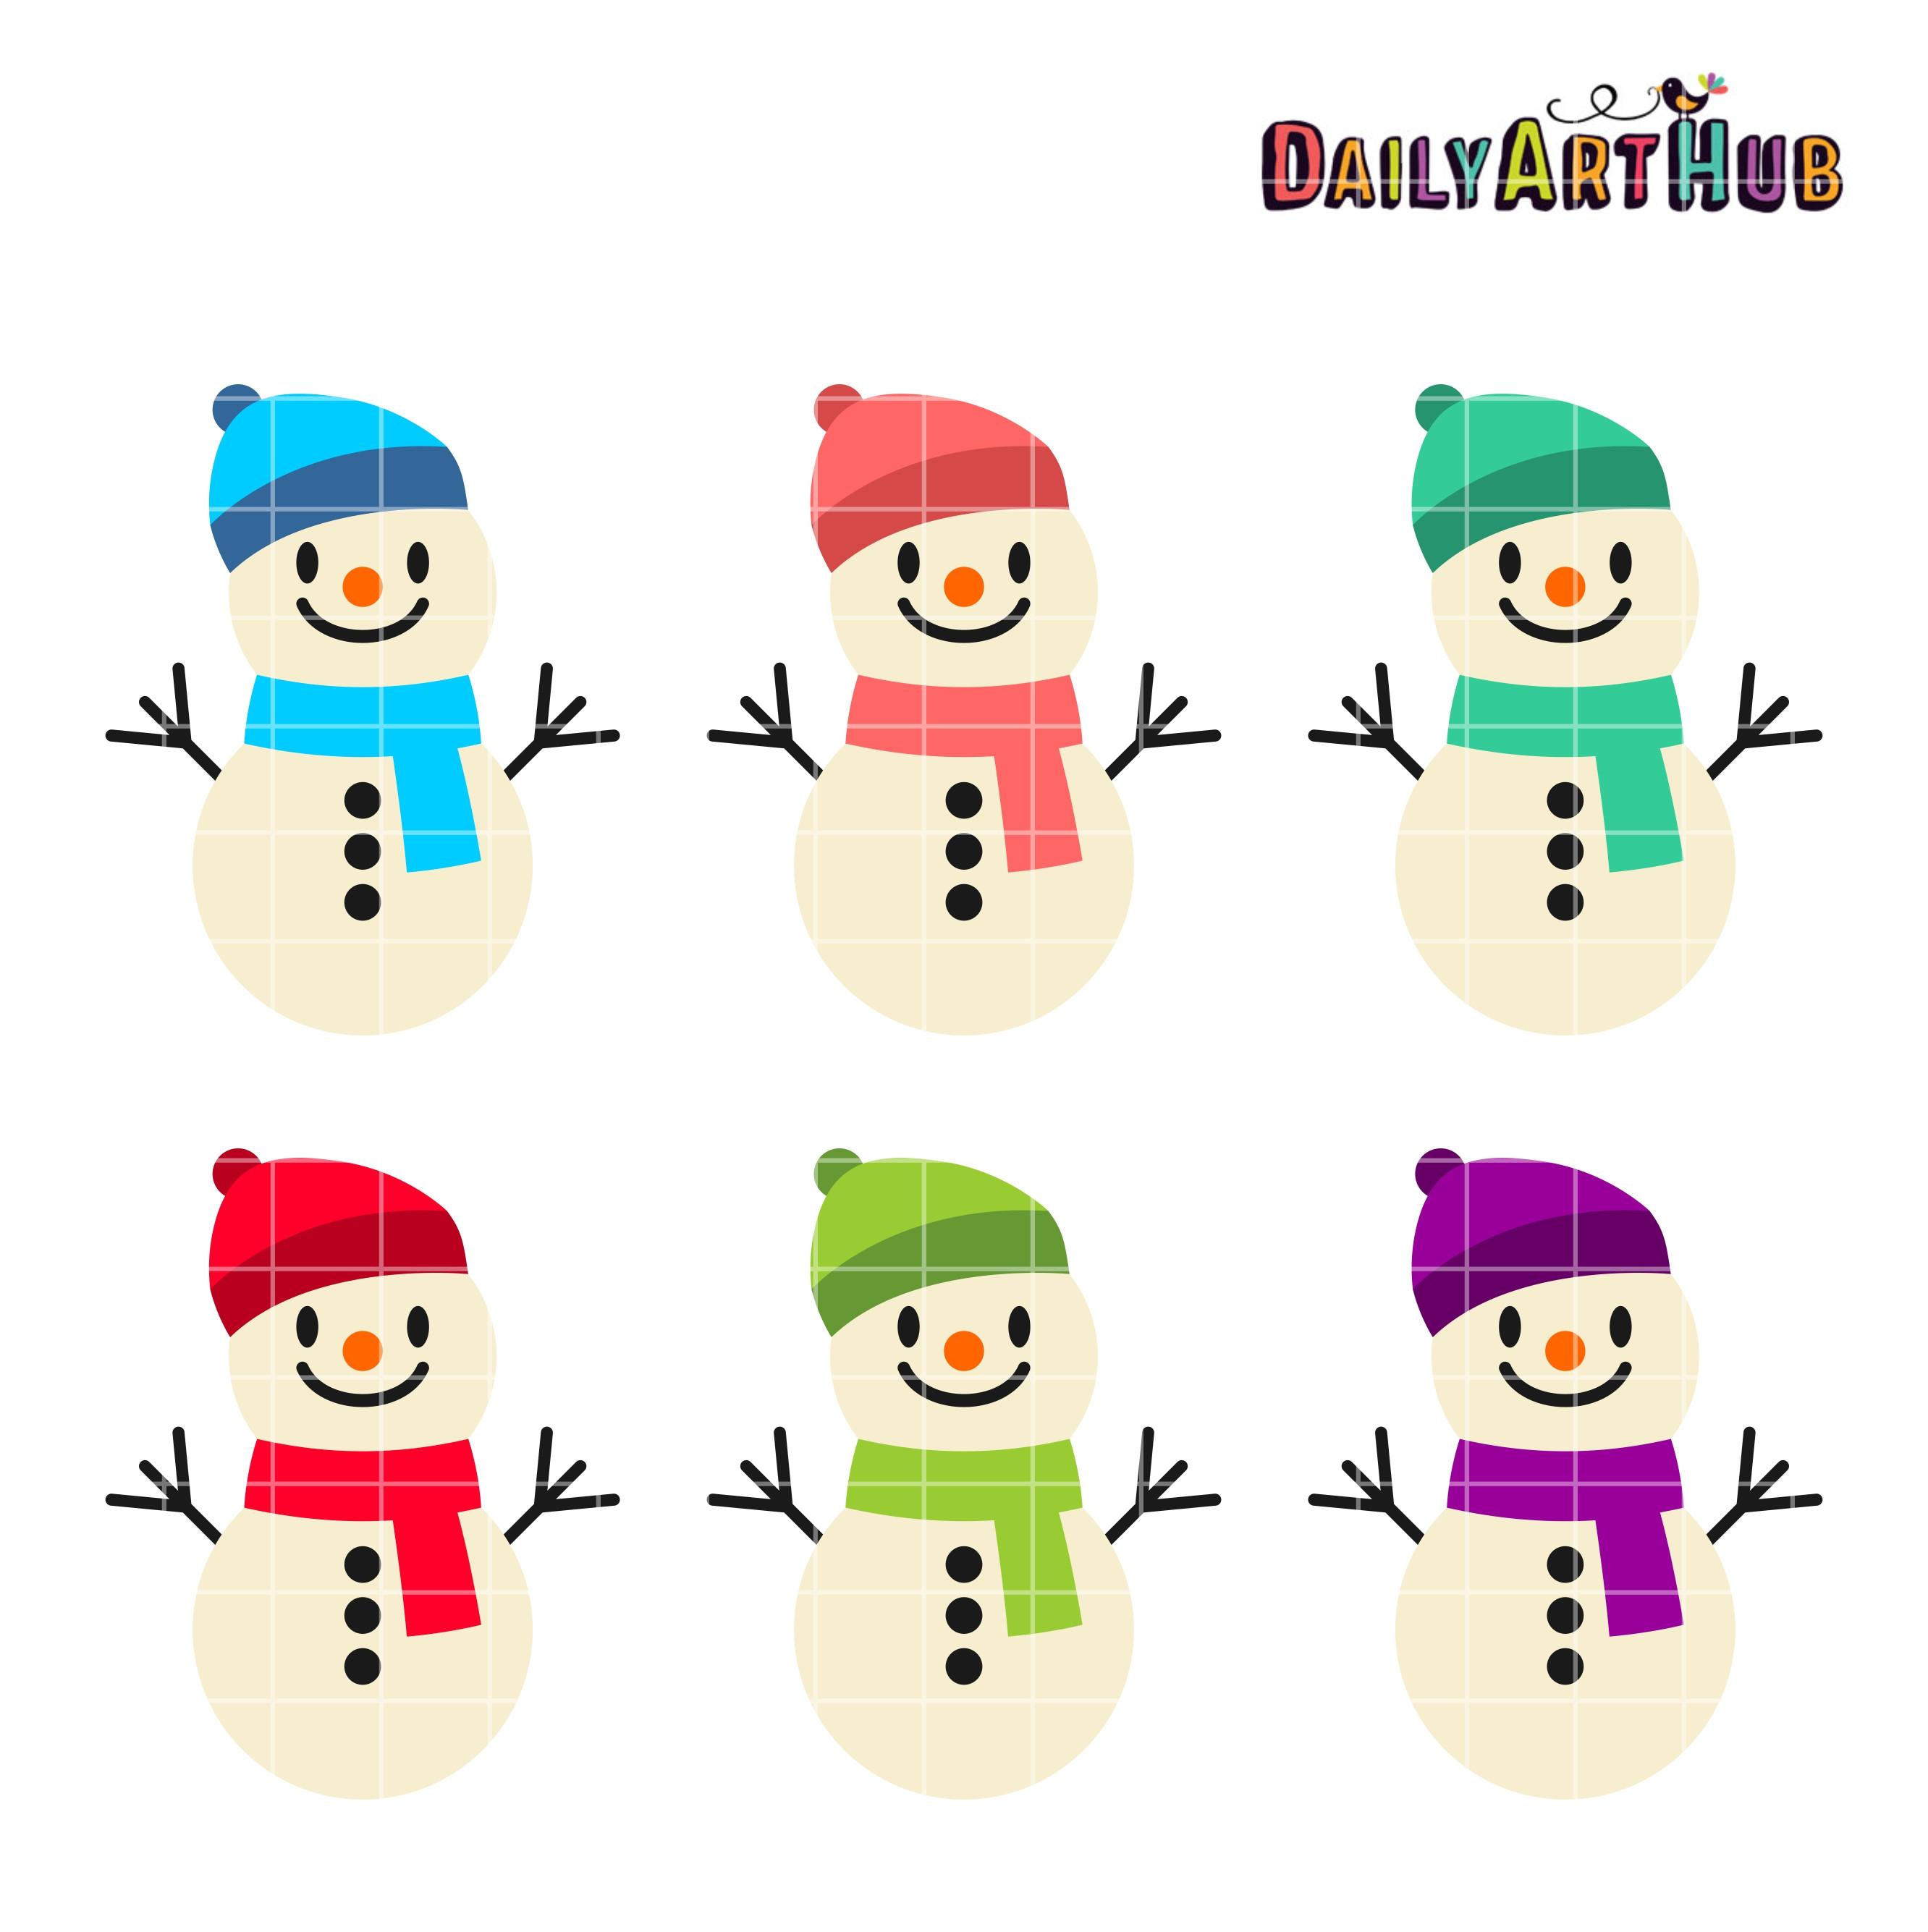 2664x2670 Cute Snowflake Clipart Snowman Free Funny Cool Transitionsfv